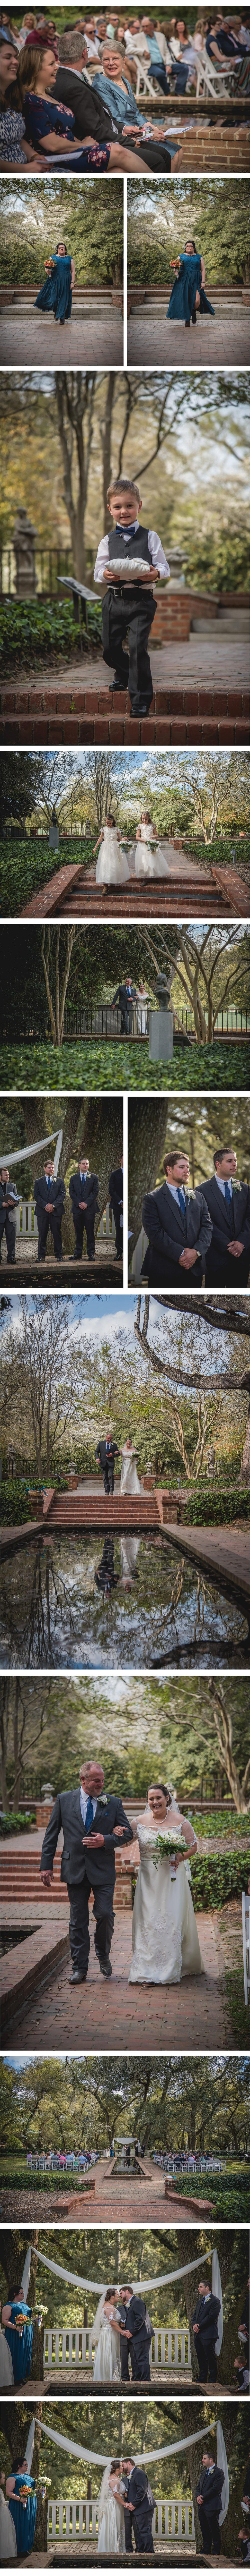 Hopelands Gardens Wedding Photographer Aiken South Carolina Northern Red Photography